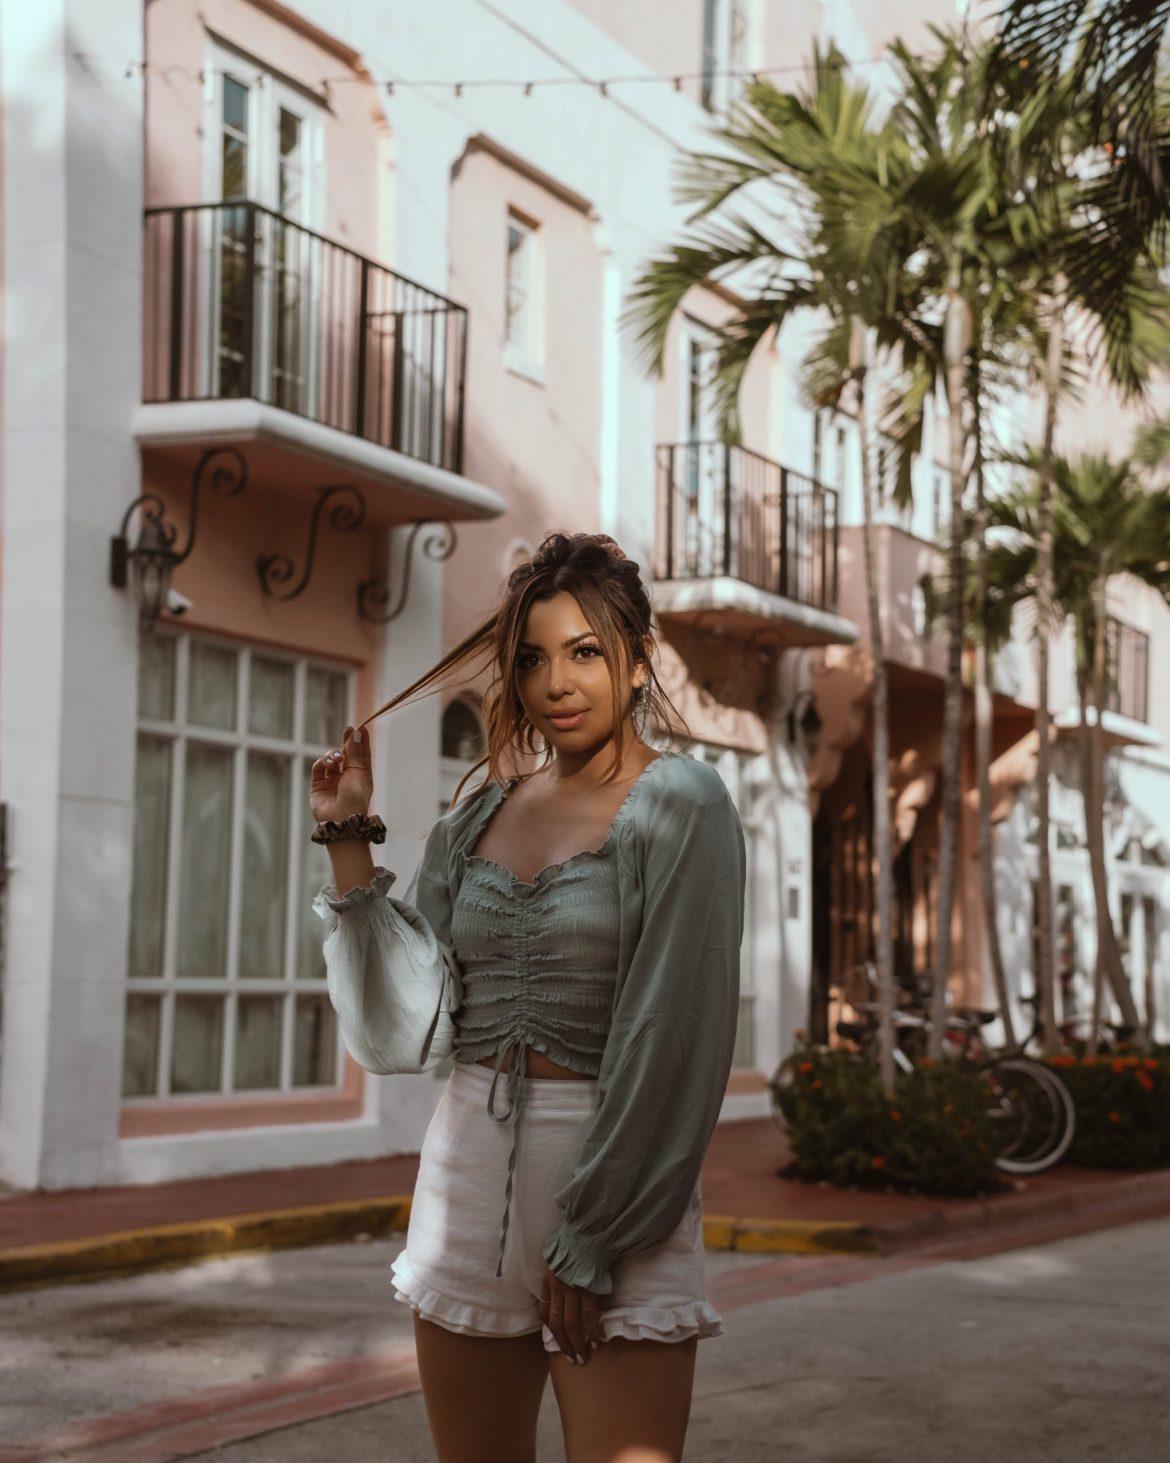 Miami Beach Travel Guide - cindyycheeks.com